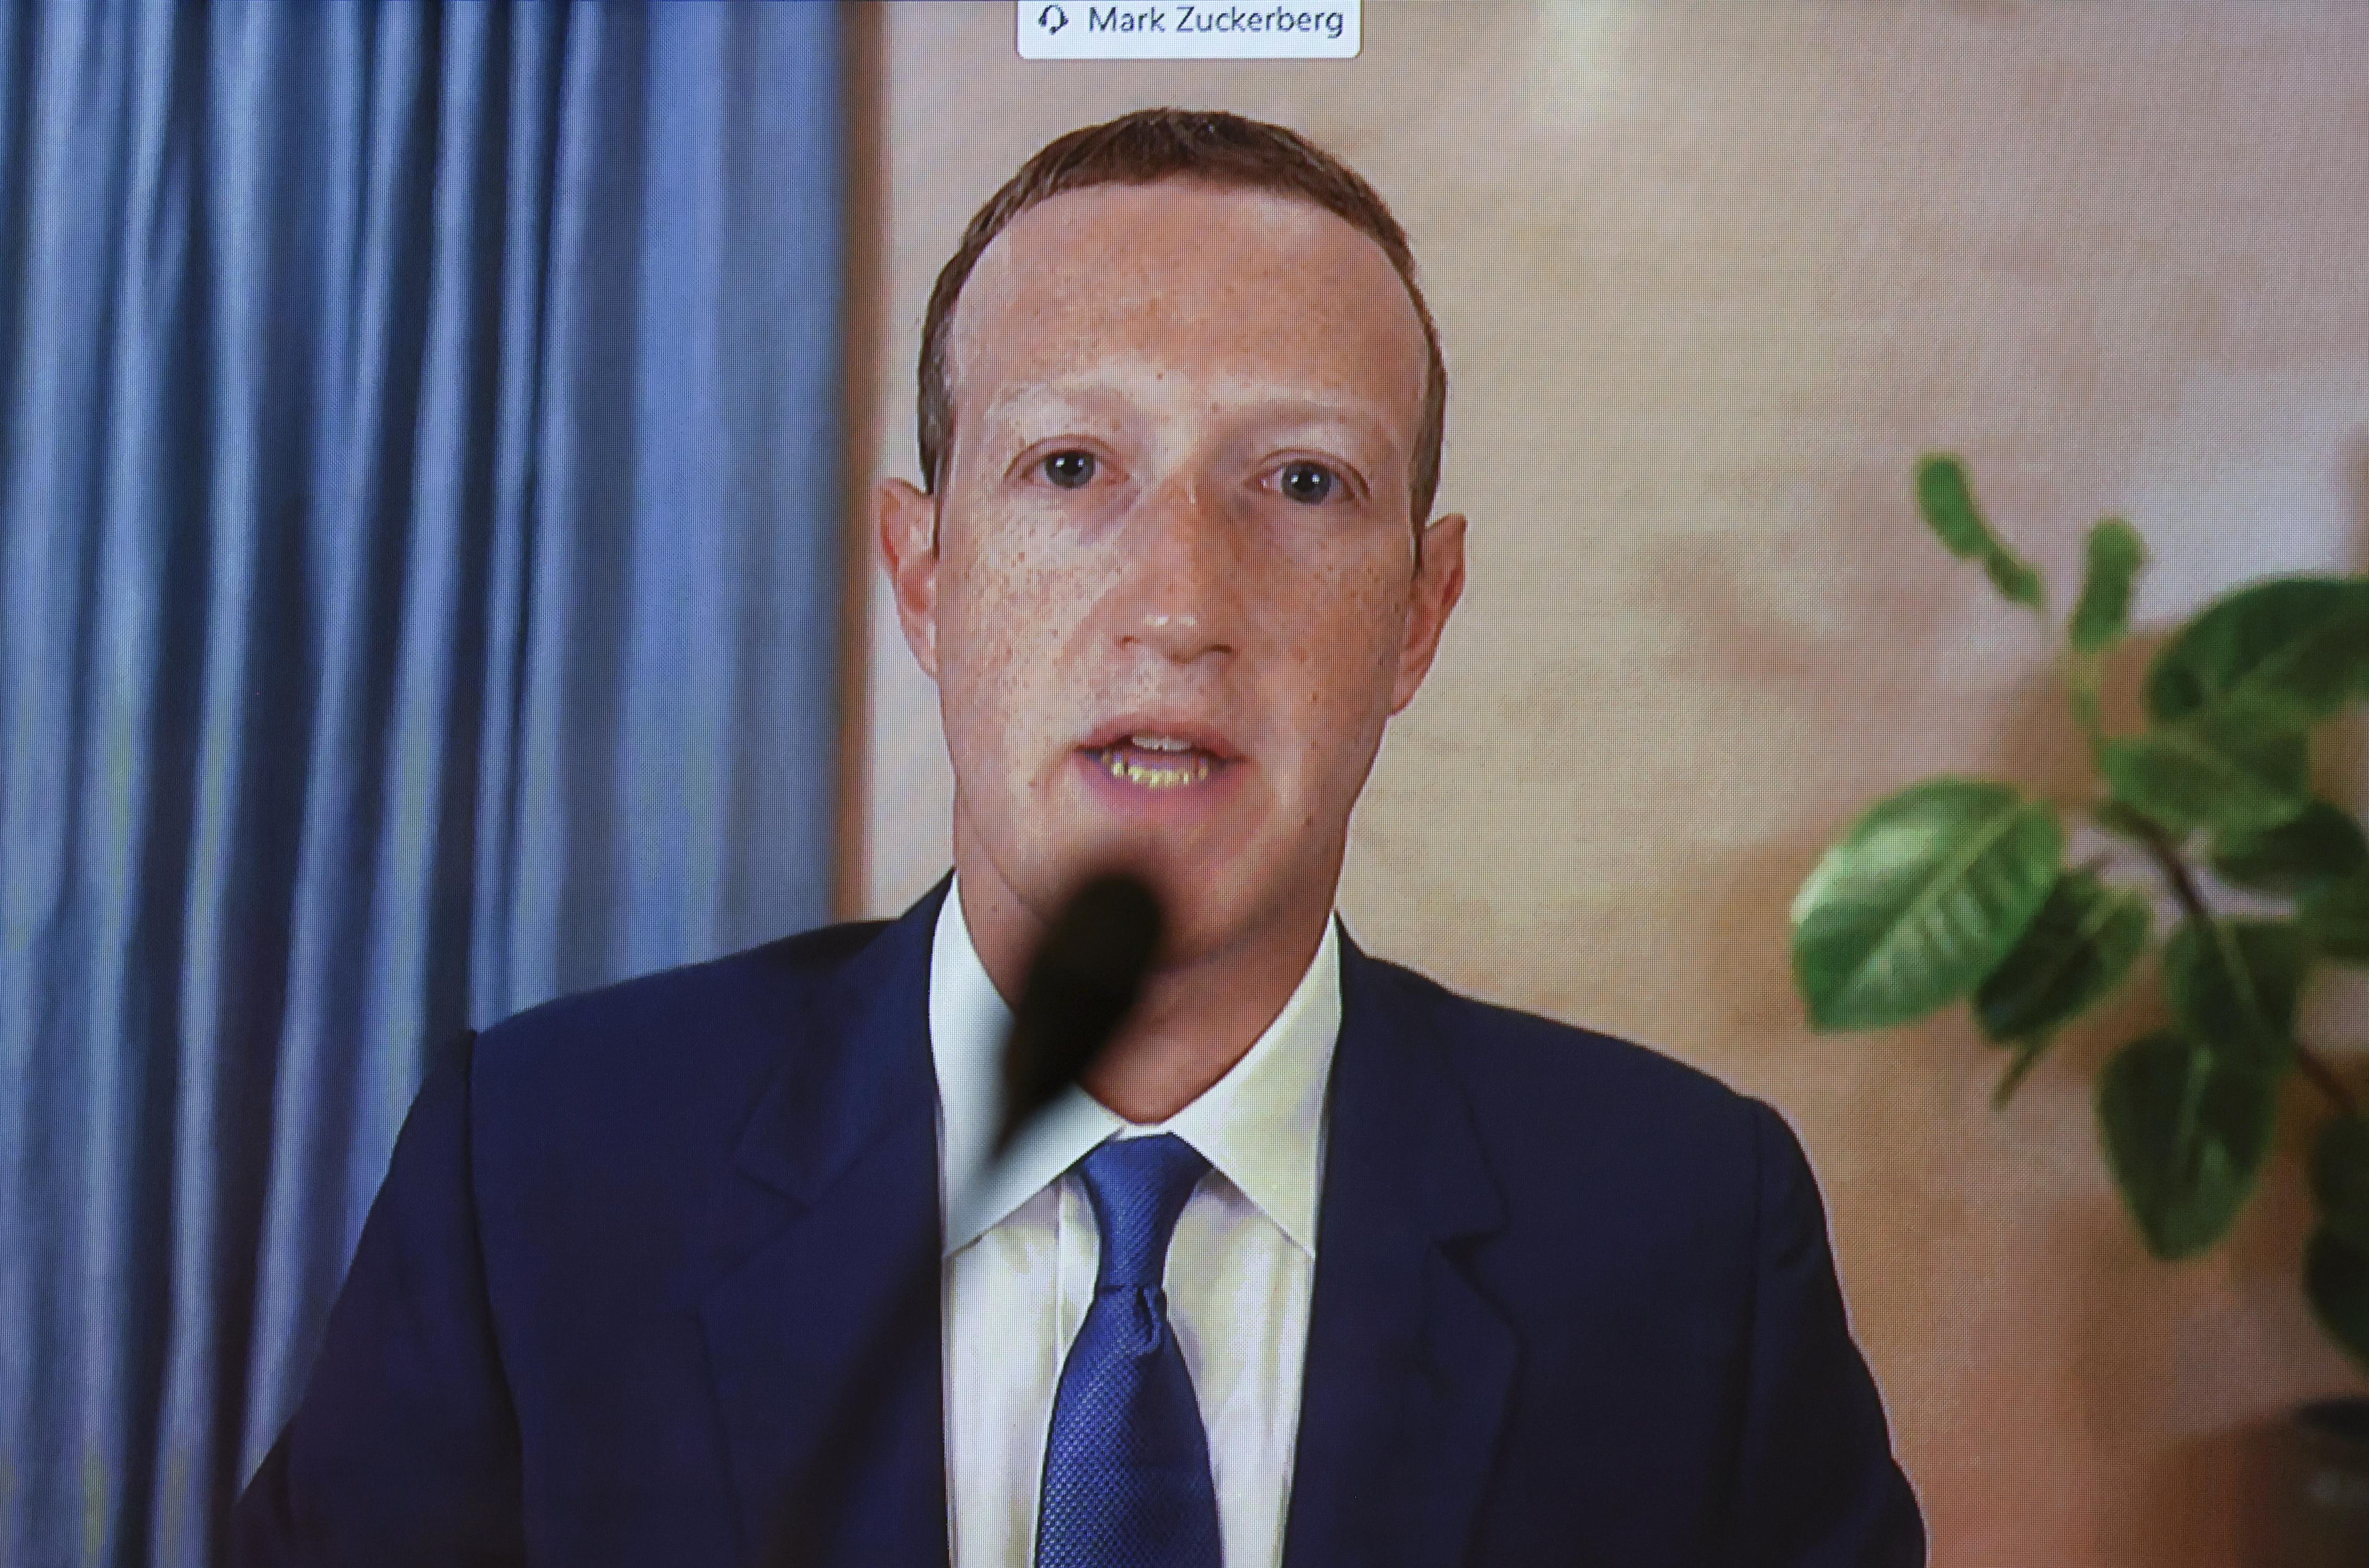 , 1 in 1,000 Views on Facebook Is of Hate Speech, Saubio Making Wealth